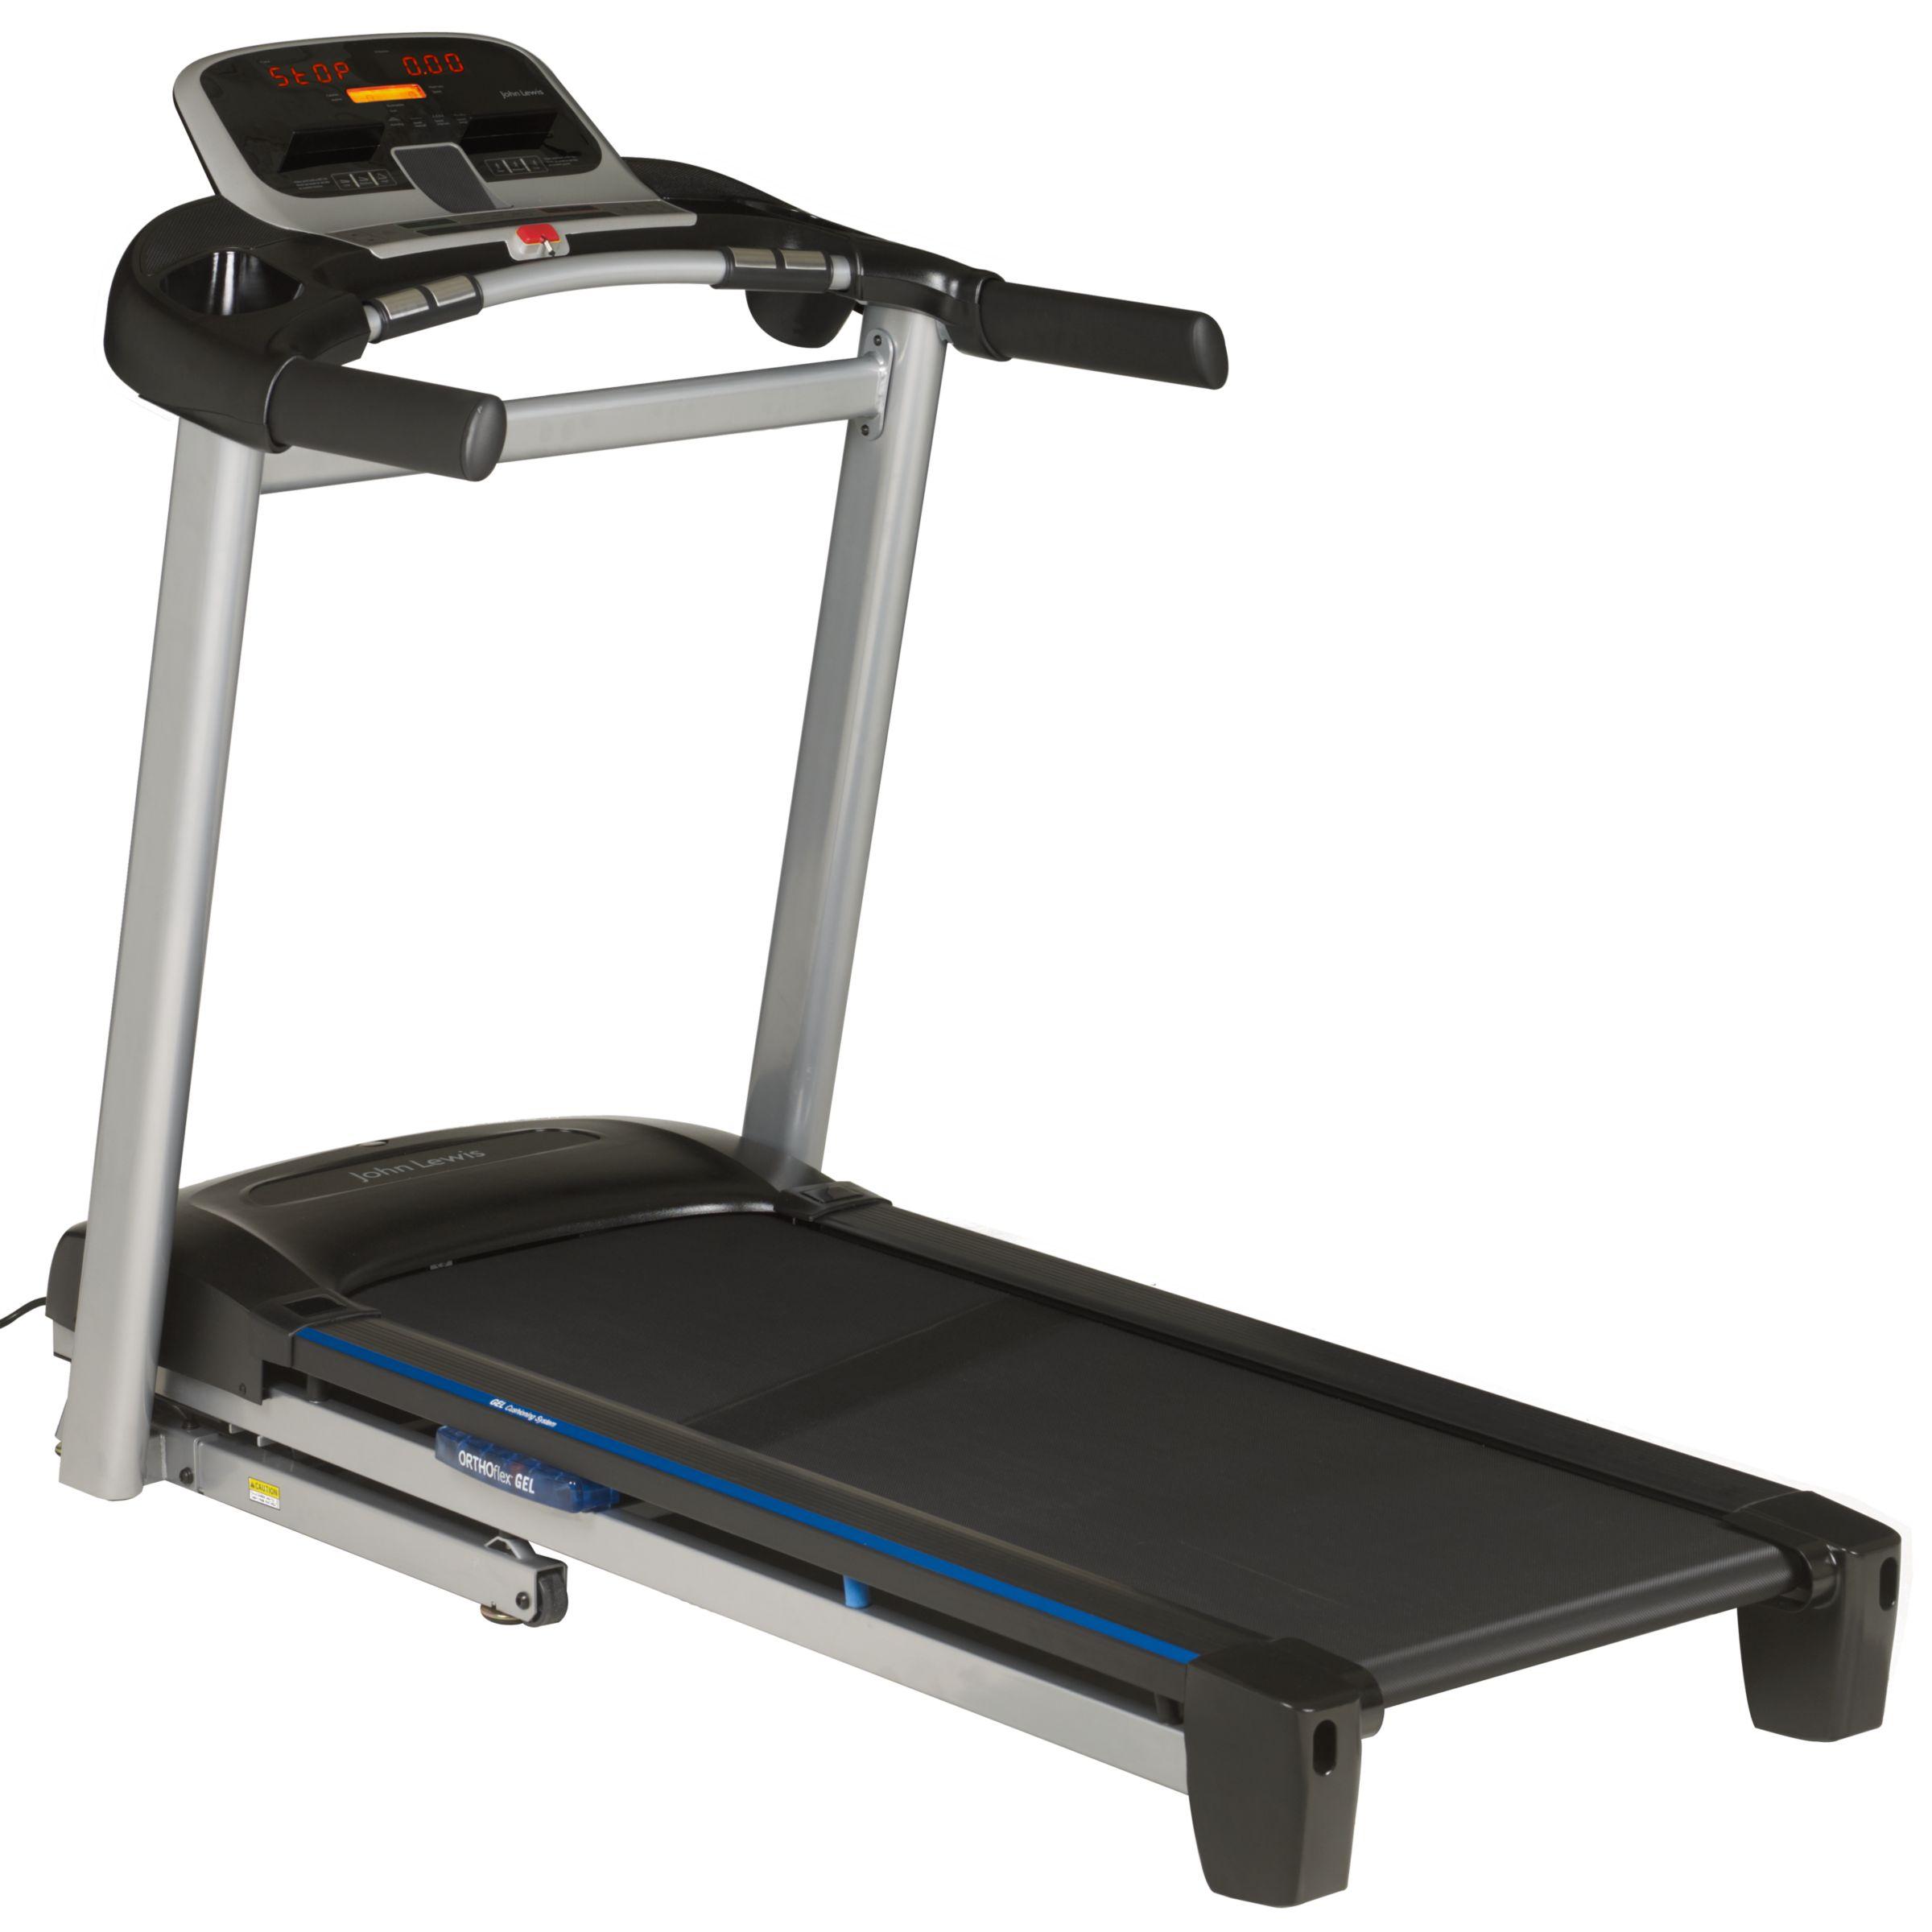 Goplus Treadmill Desk: John Lewis TR3 Folding Treadmill